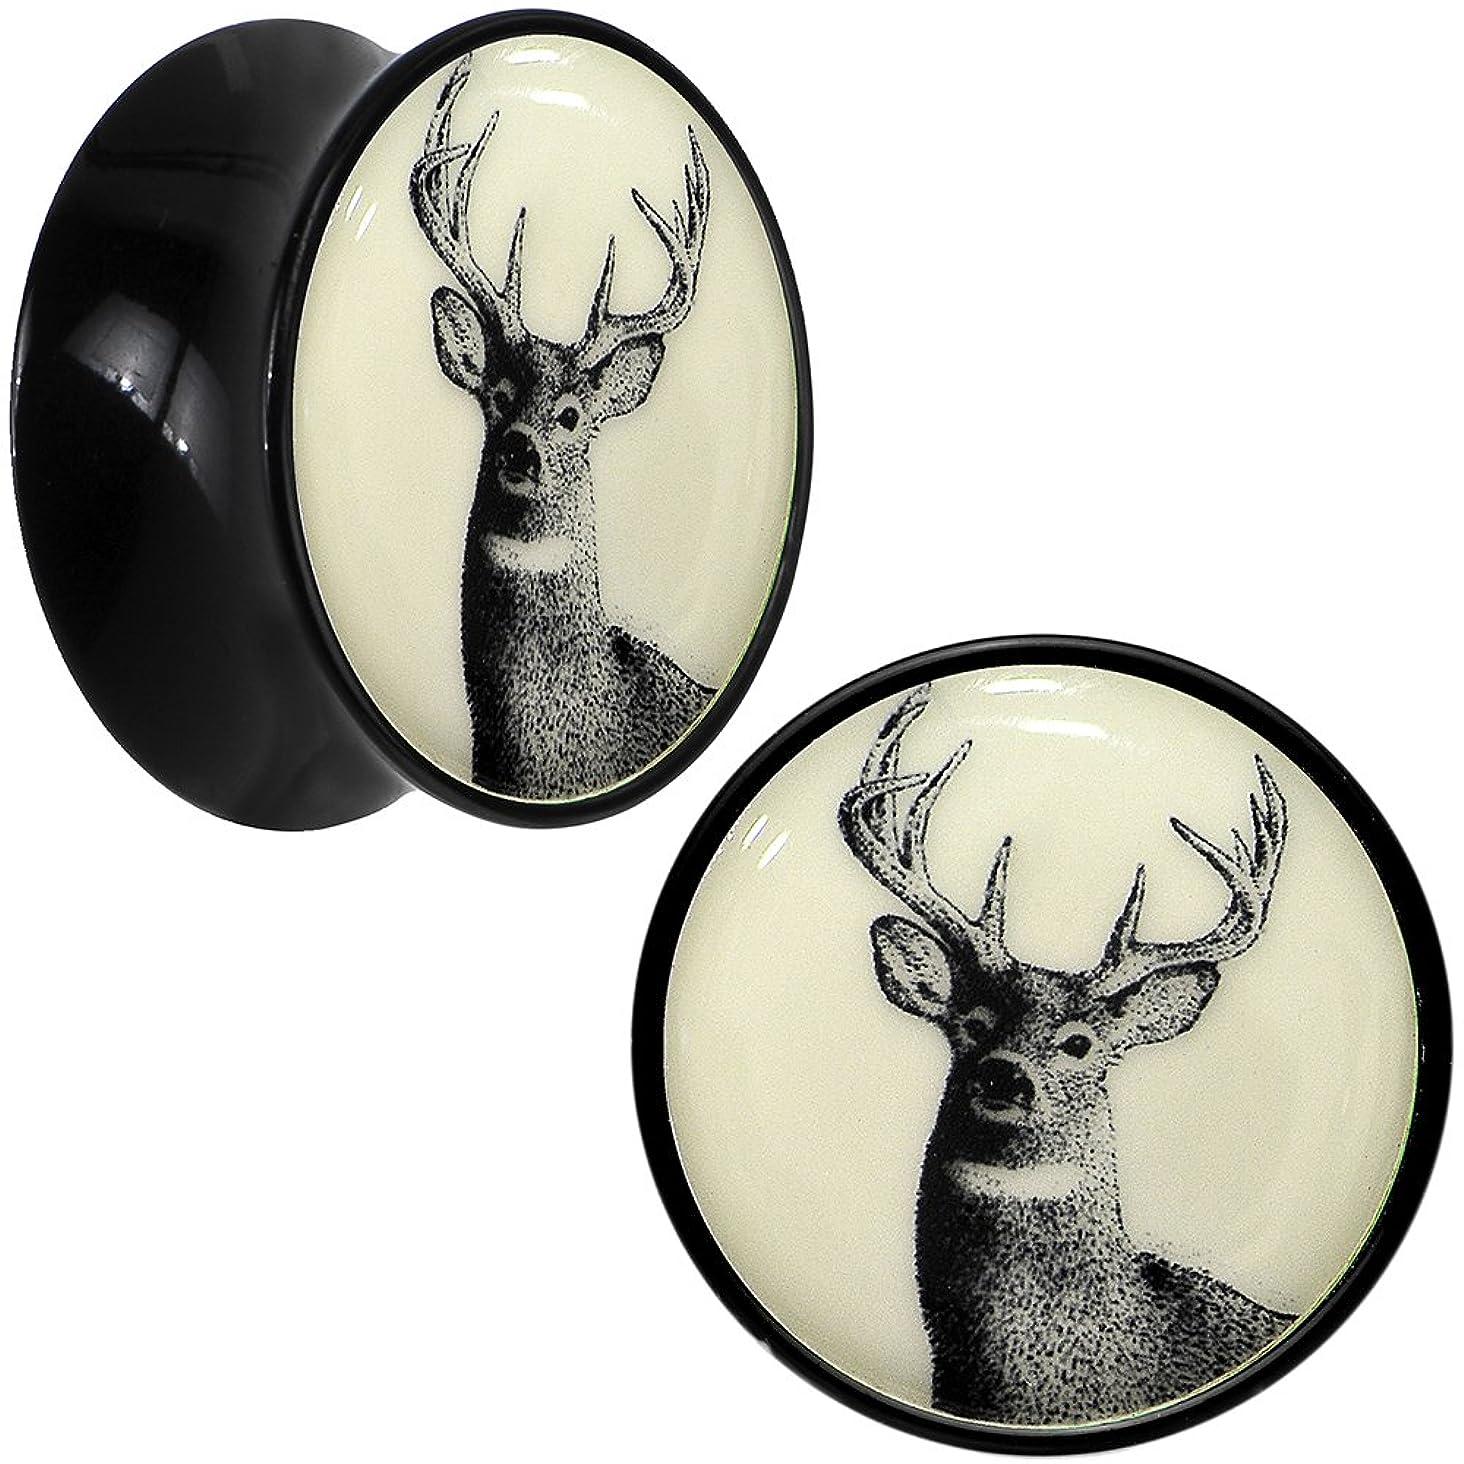 Body Candy Black Acrylic Buck Deer Glow in The Dark Saddle Ear Gauge Plug Pair 20mm